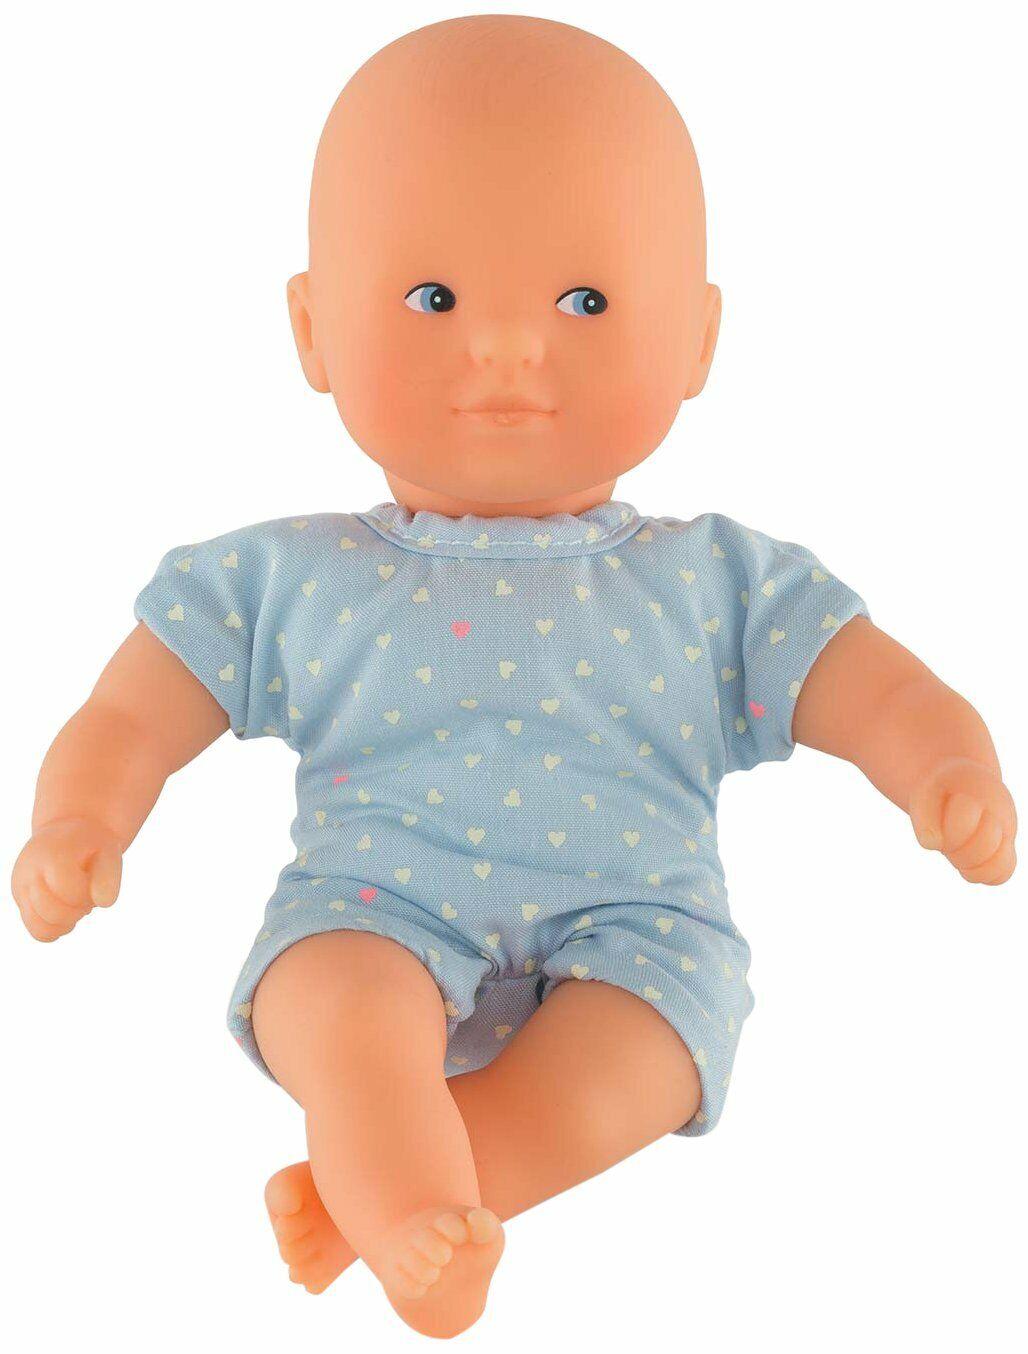 Corolle Mon Premier Poupon Mini Calin SKY Toy Baby Doll New